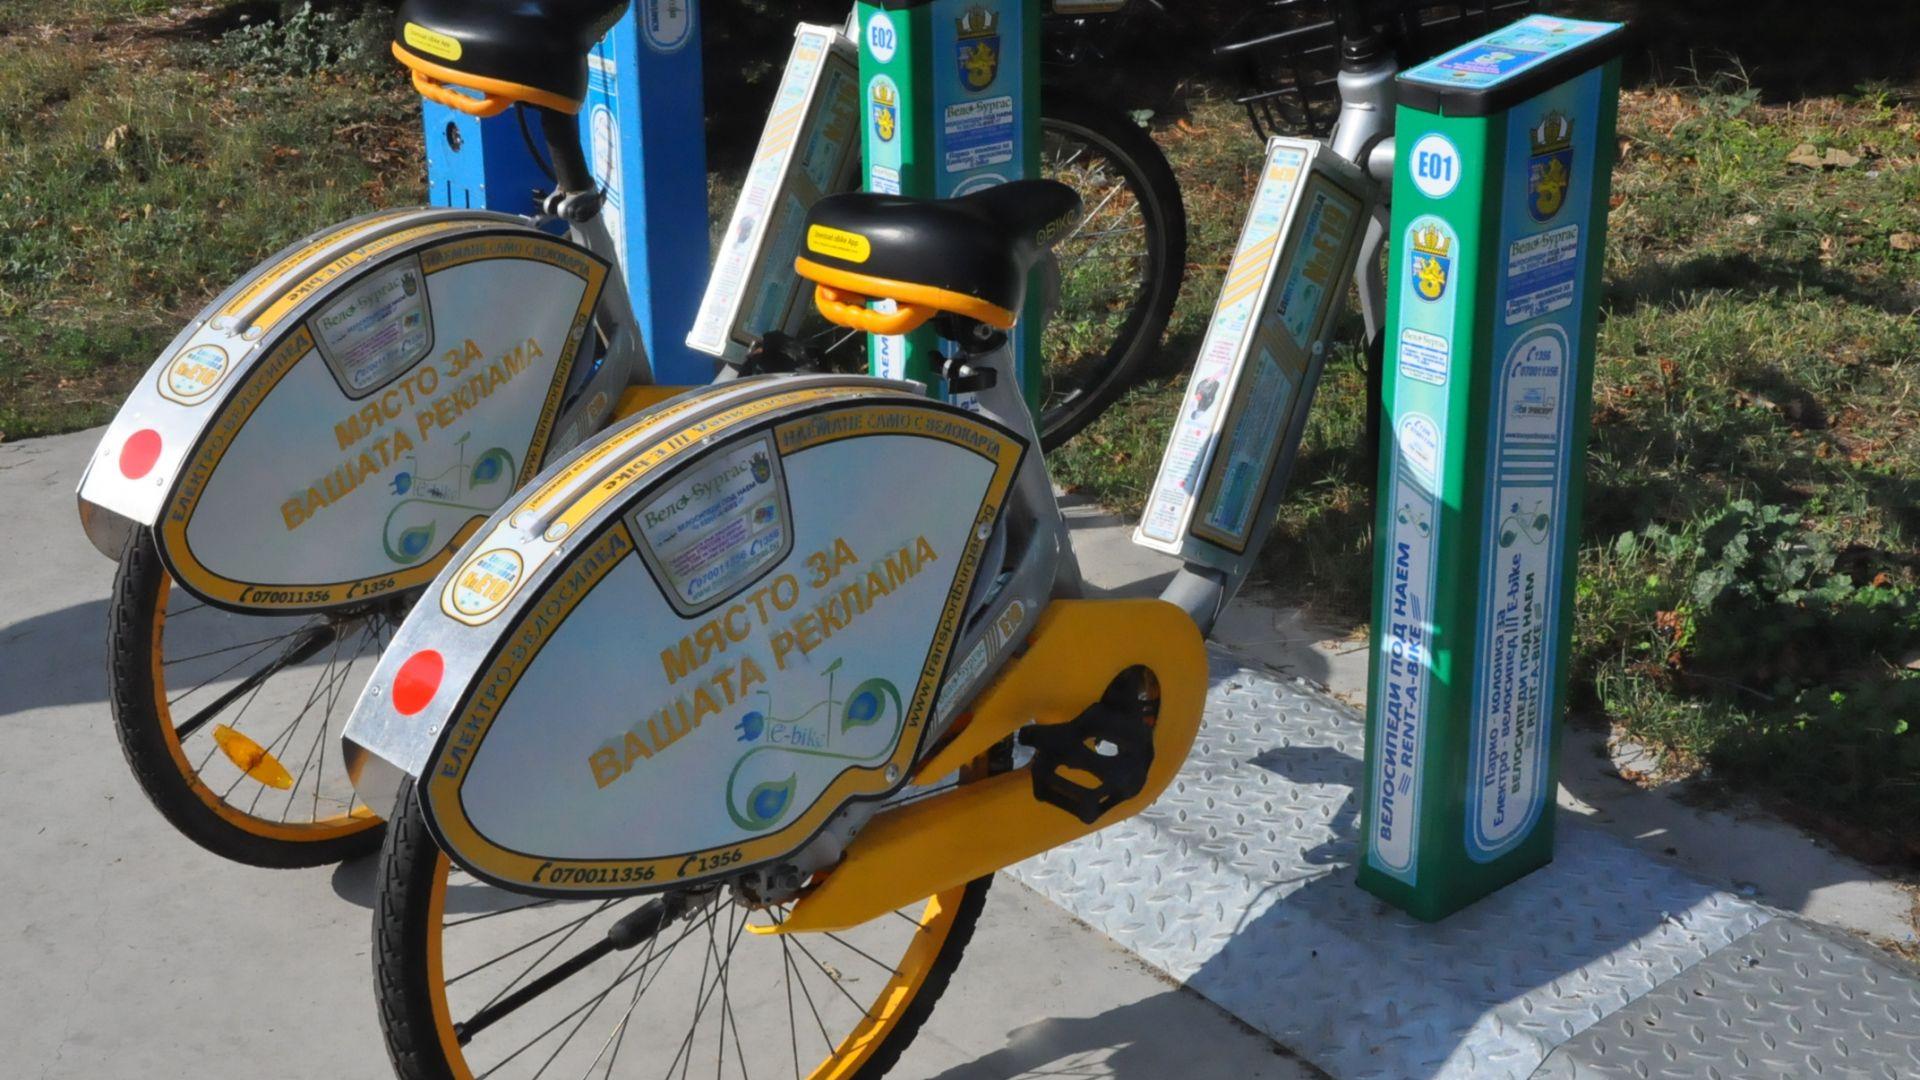 Нови стоянки за електрически велосипеди под наем в Бургас (снимки)